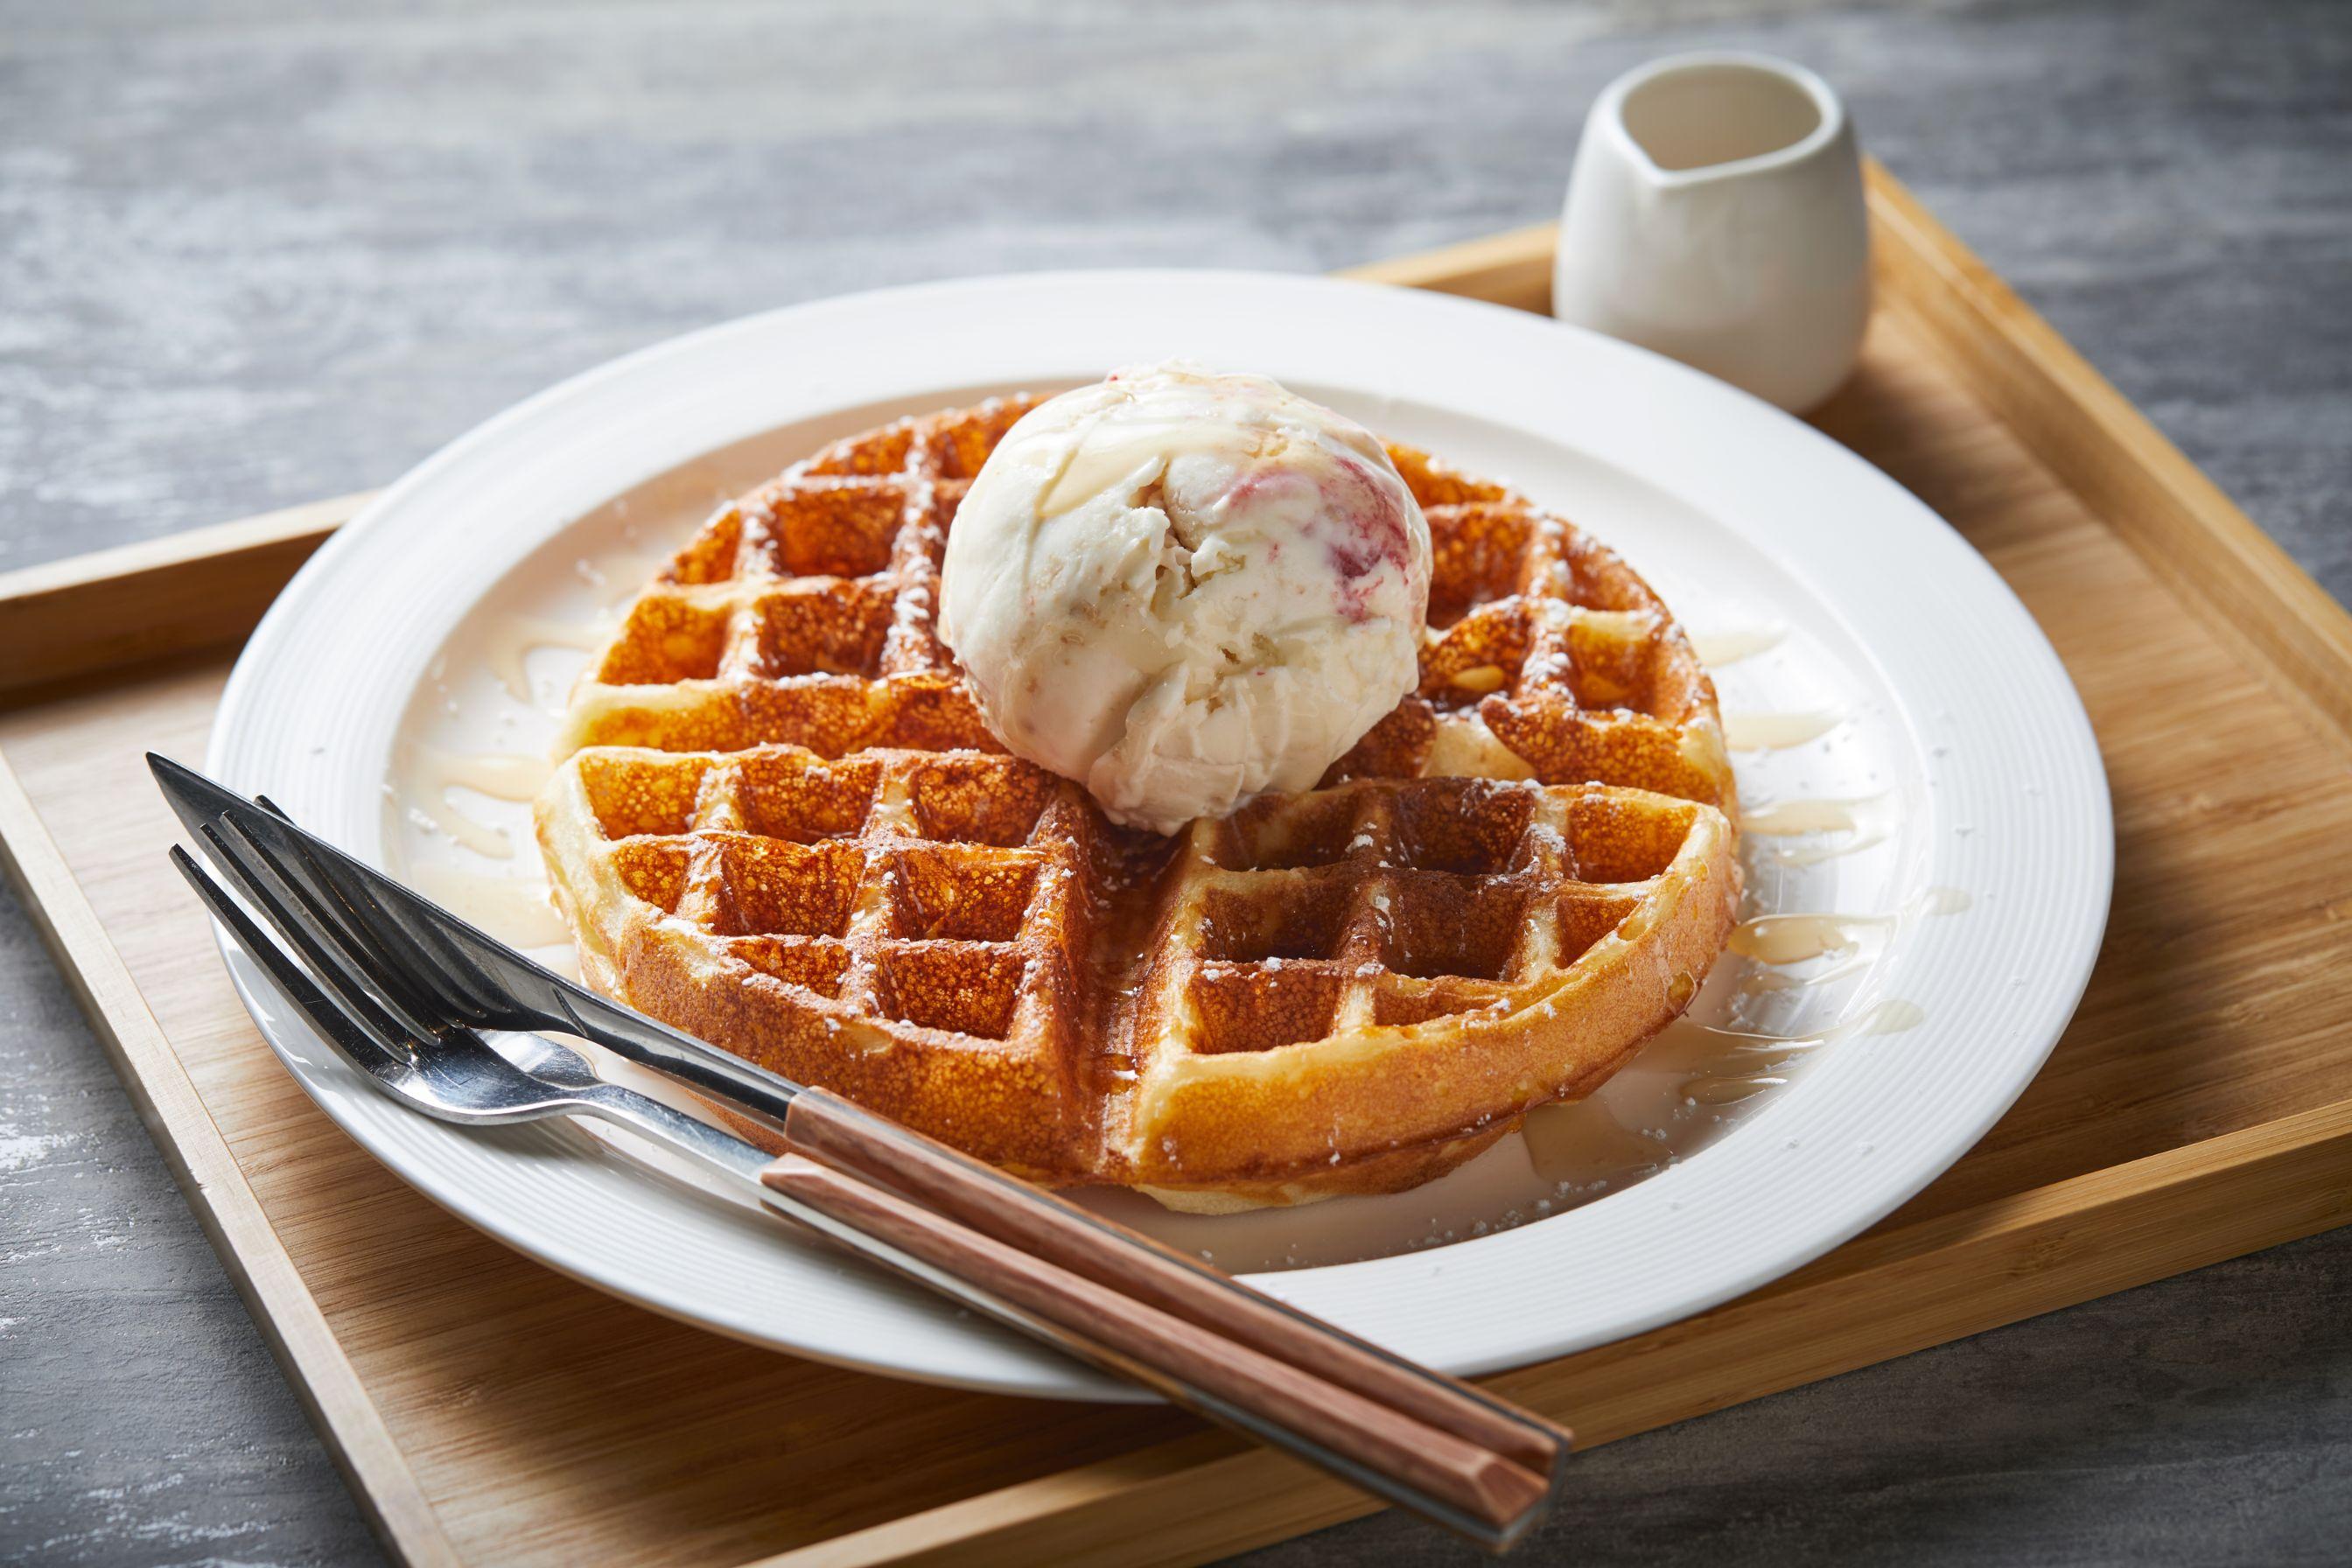 1 x Waffles with Gelato (Single Scoop) + 1 x Iced Latte